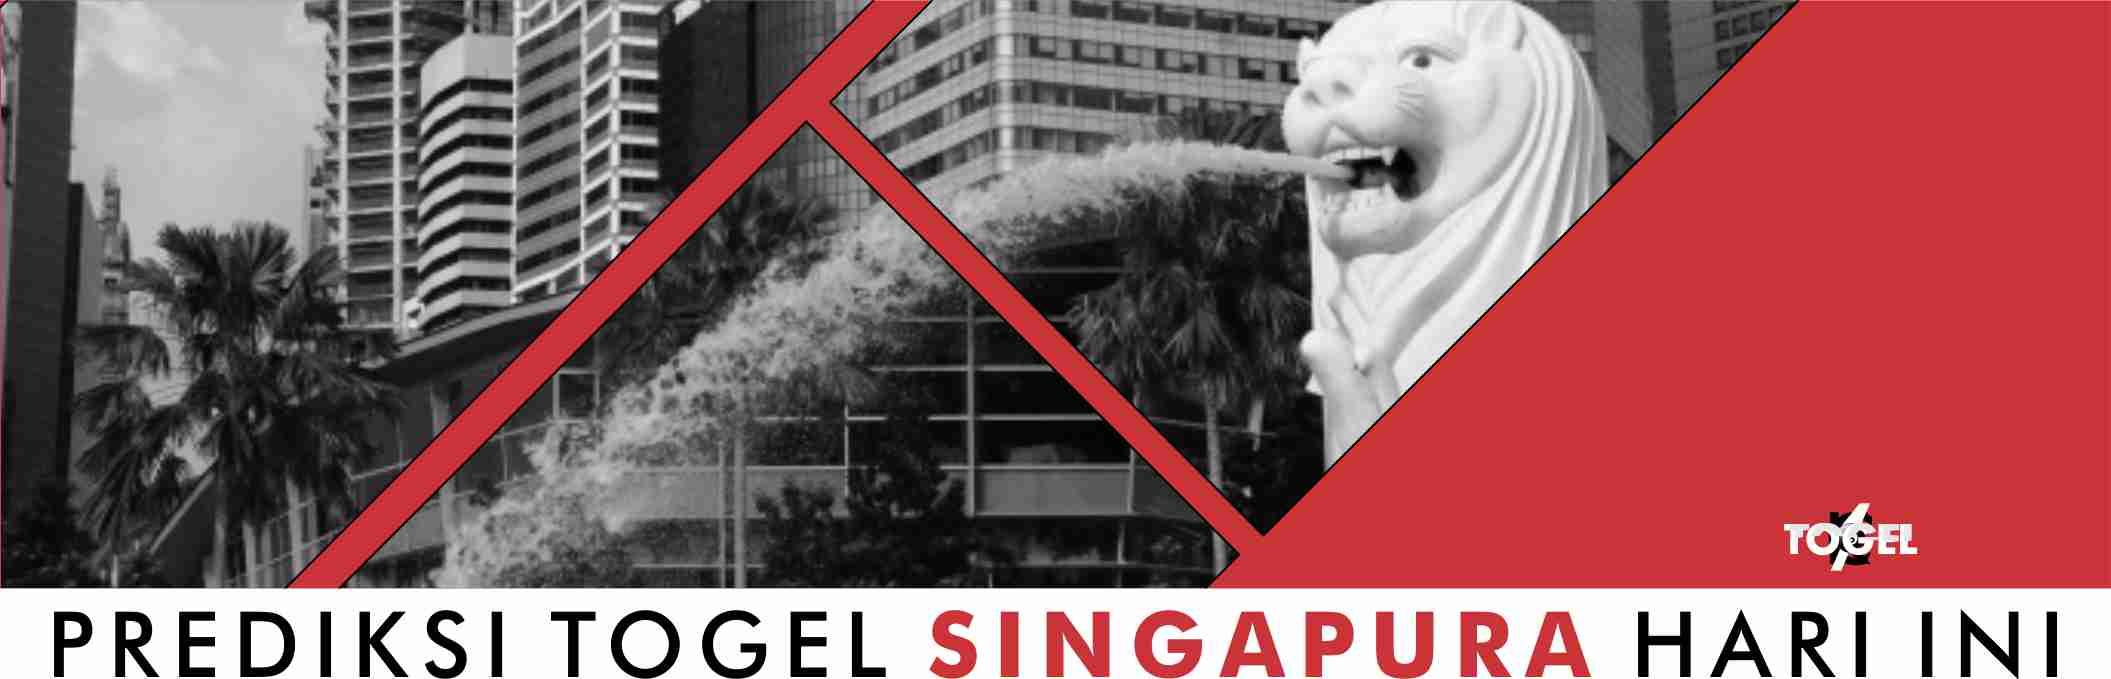 Prediksi Togel Singapura 10 April 2019